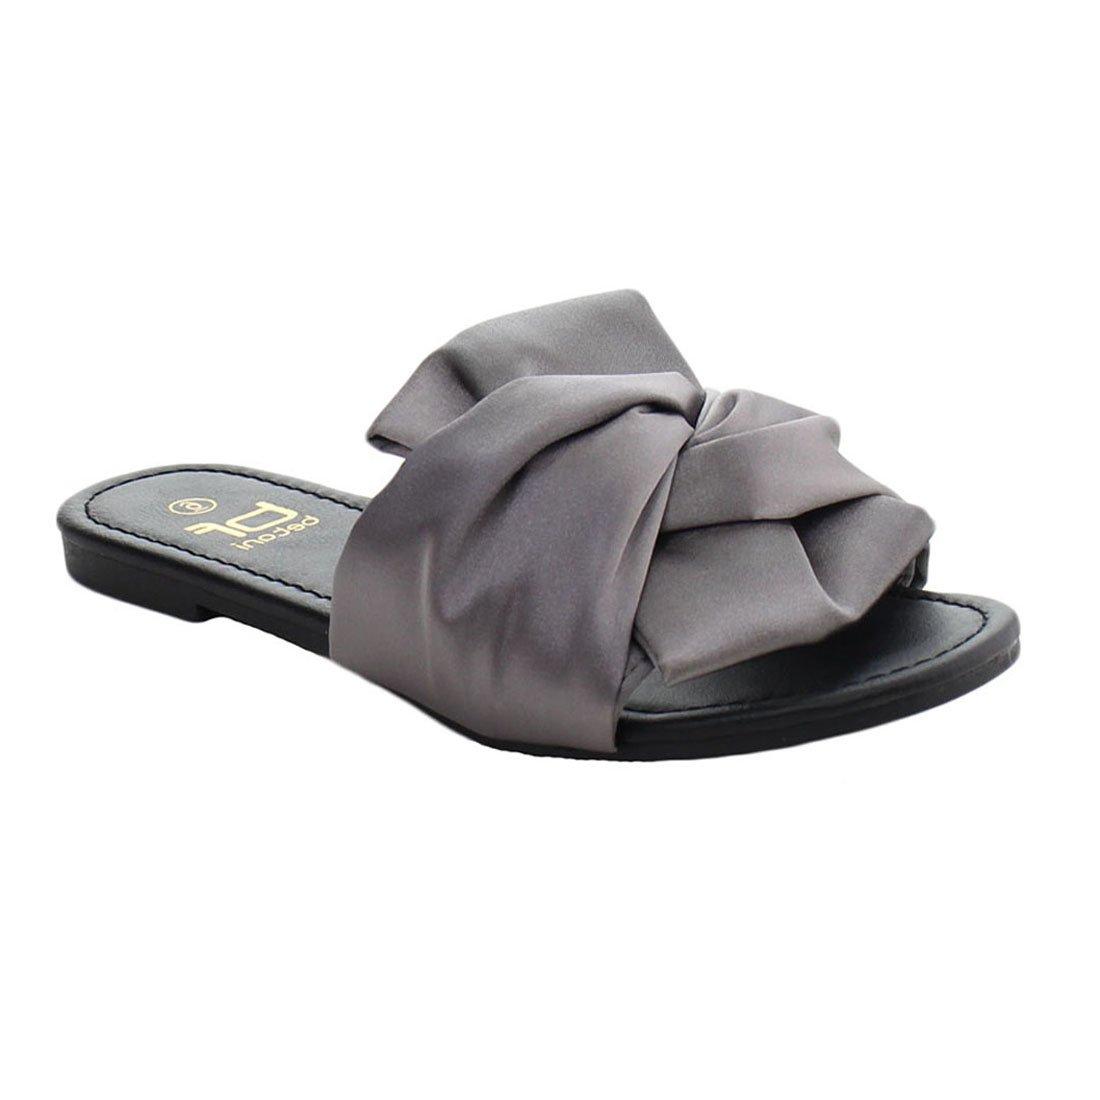 7c73b6b4d63 Betani EL79 Women s Bow Easy Slip On Knot Backless Flat Sandals Grey